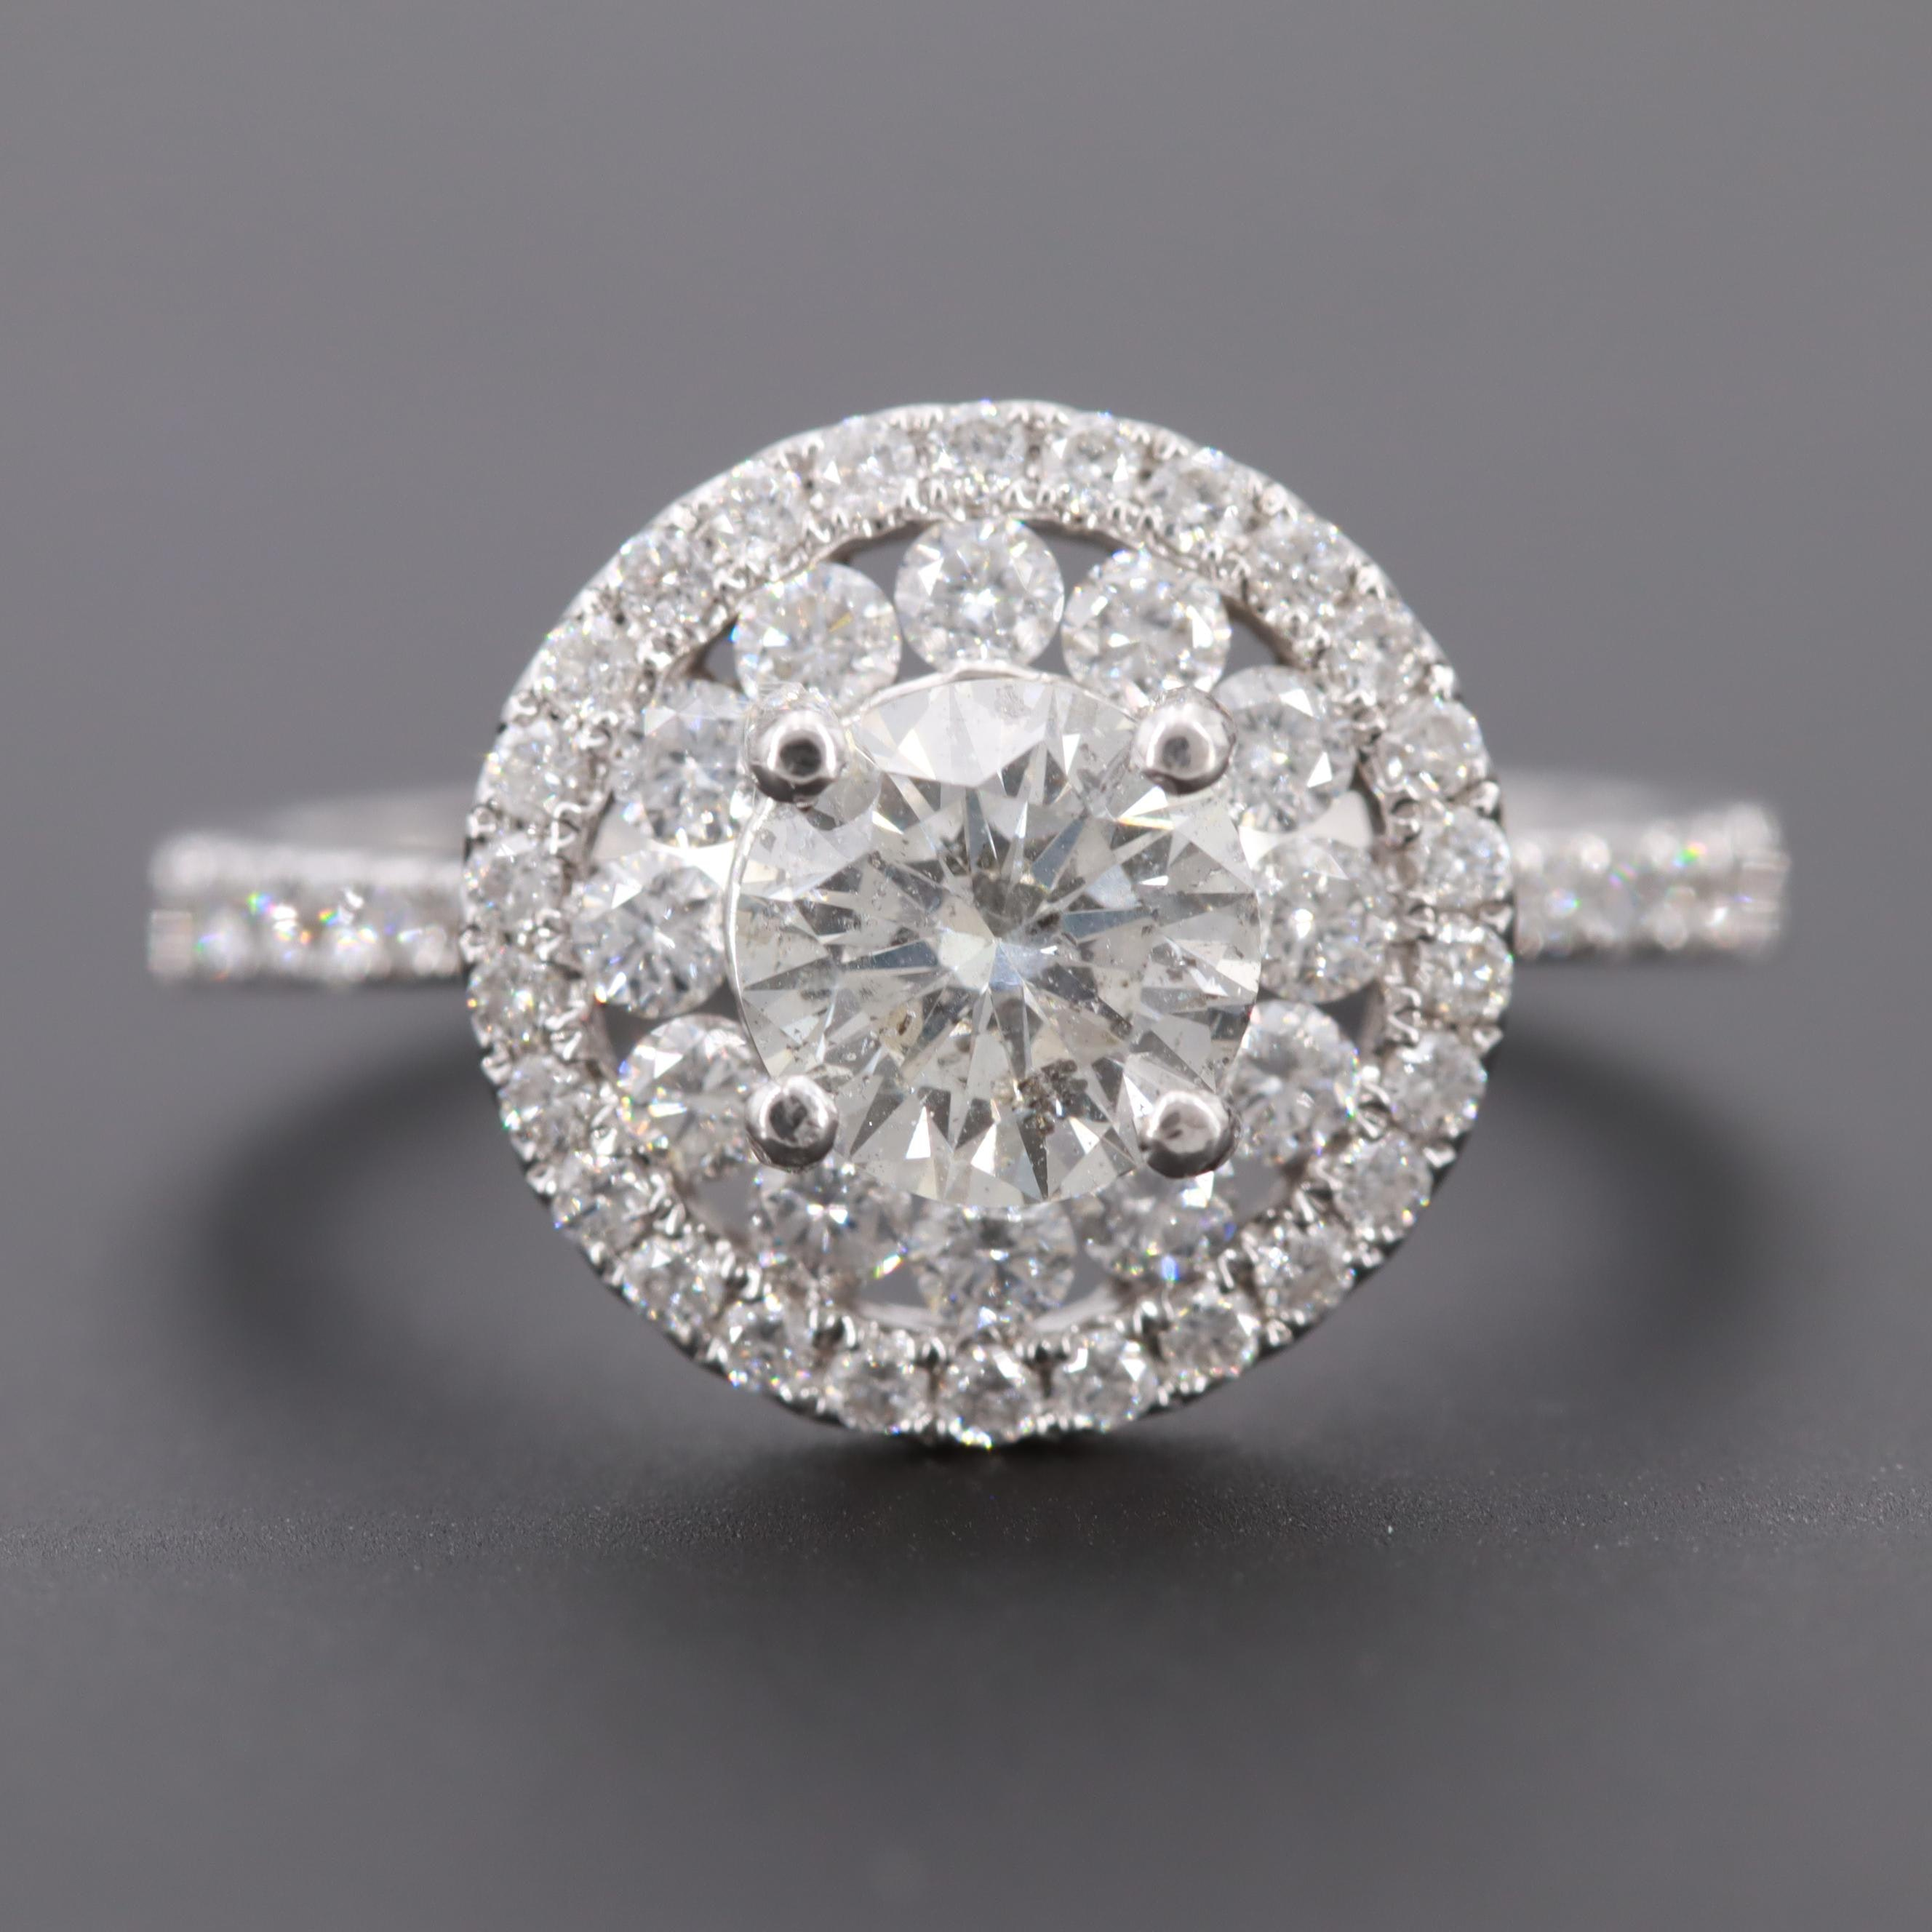 S. Kashi 14K White Gold 1.64 CTW Diamond Ring